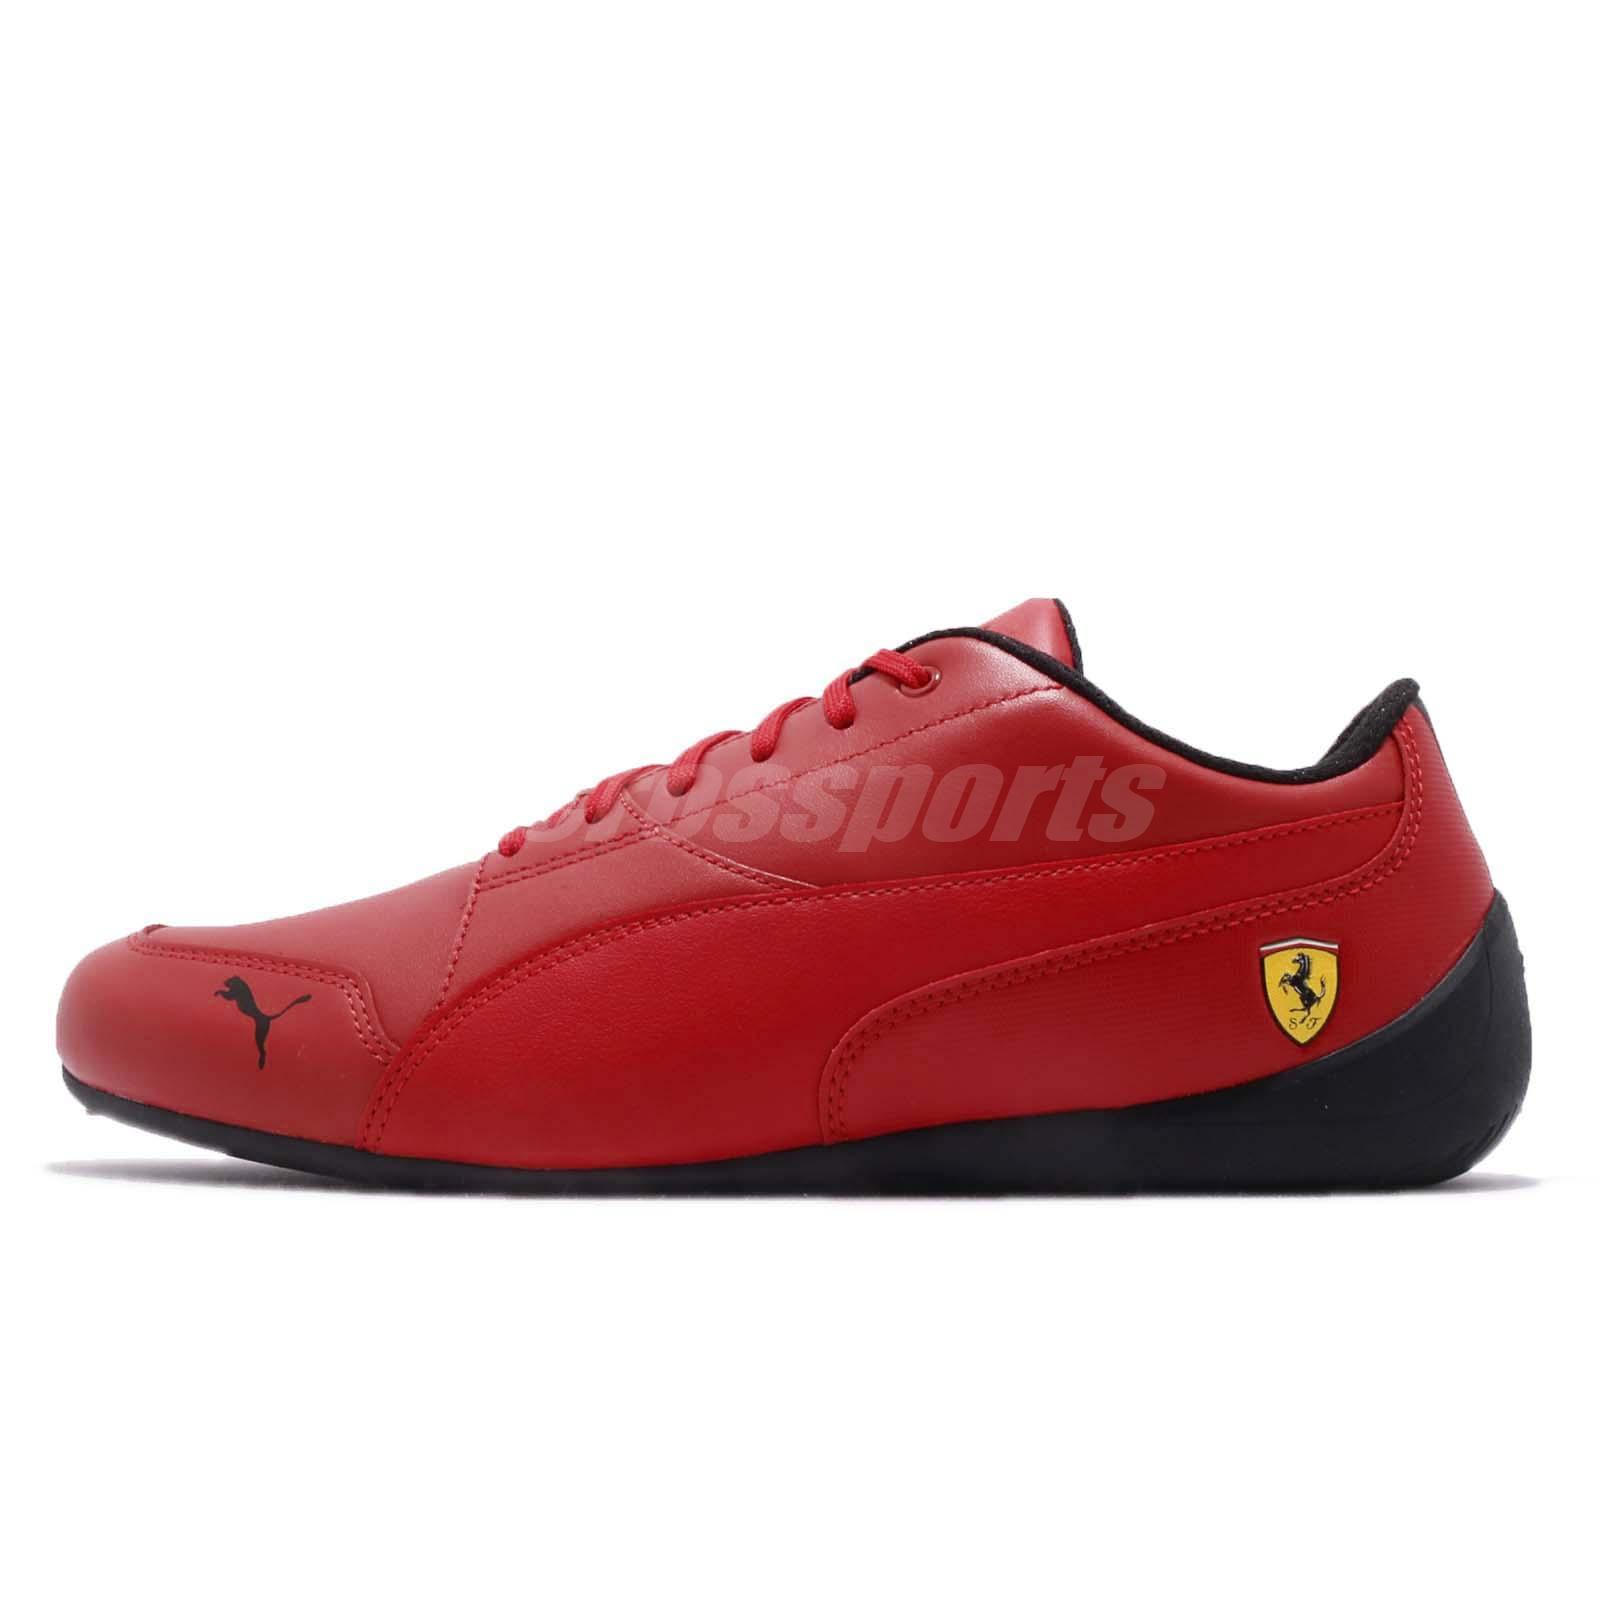 Puma SF Drift Cat 7 Ferrari Red Black Men Women Motorsport Shoes 305998-04 cb0f5f608